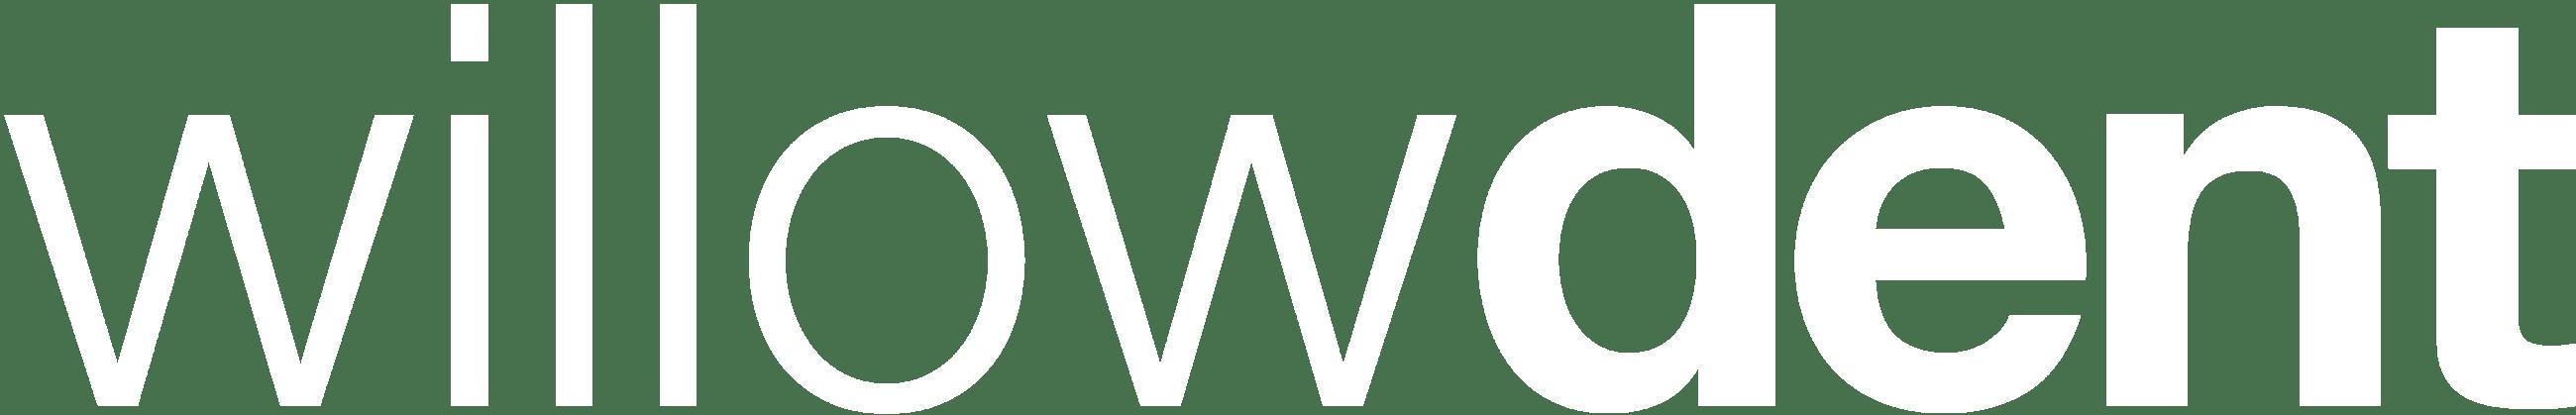 Dentální hygiena Willowdent Praha 5 logo